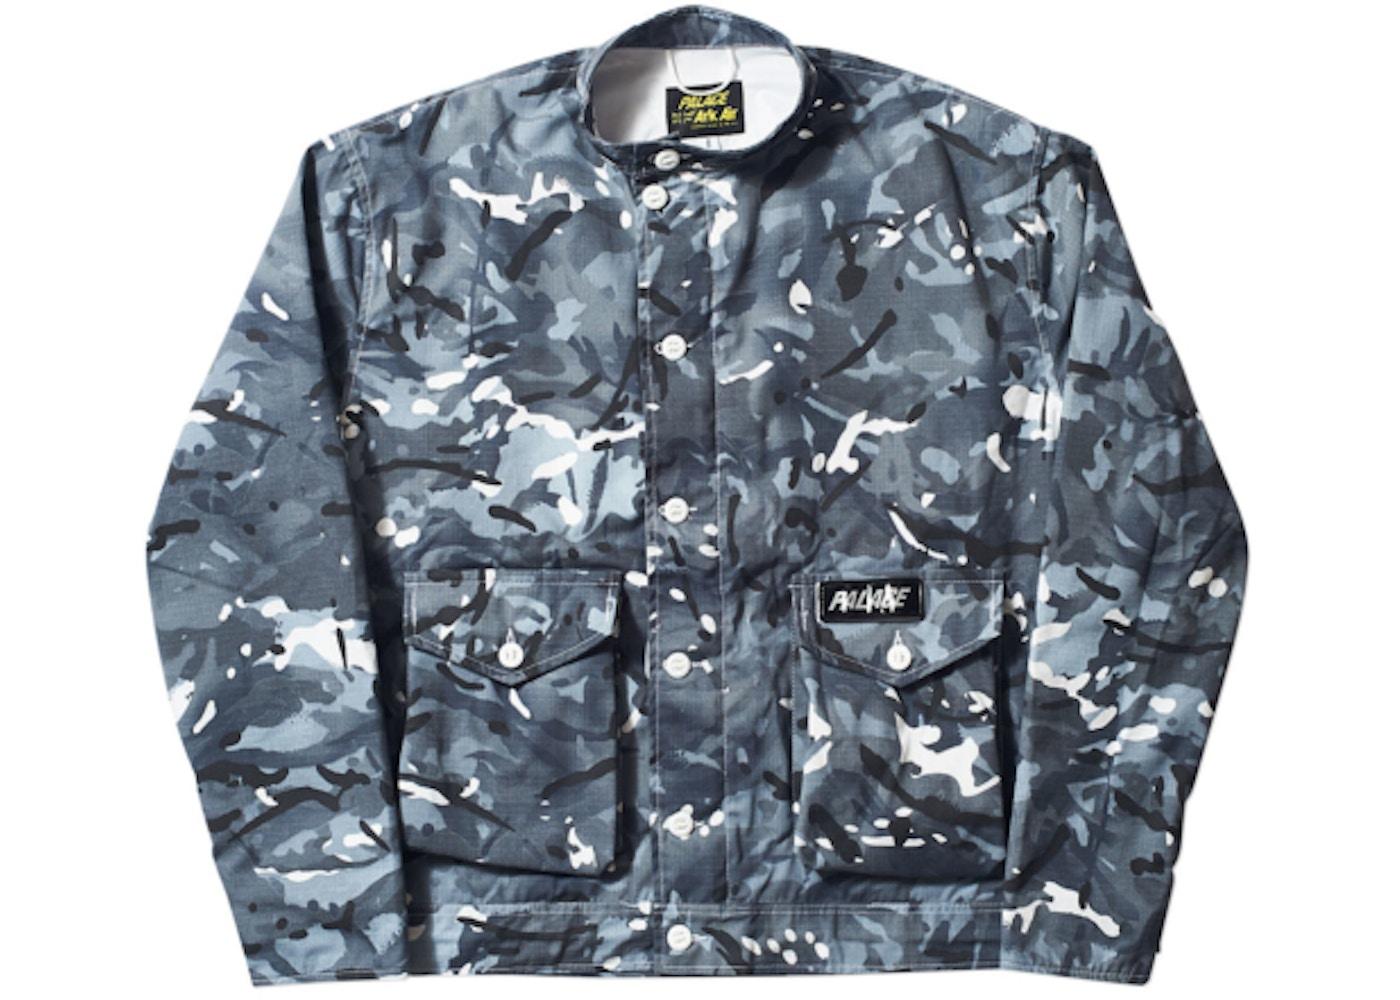 58f62543508a Streetwear - Palace Jackets - Lowest Ask